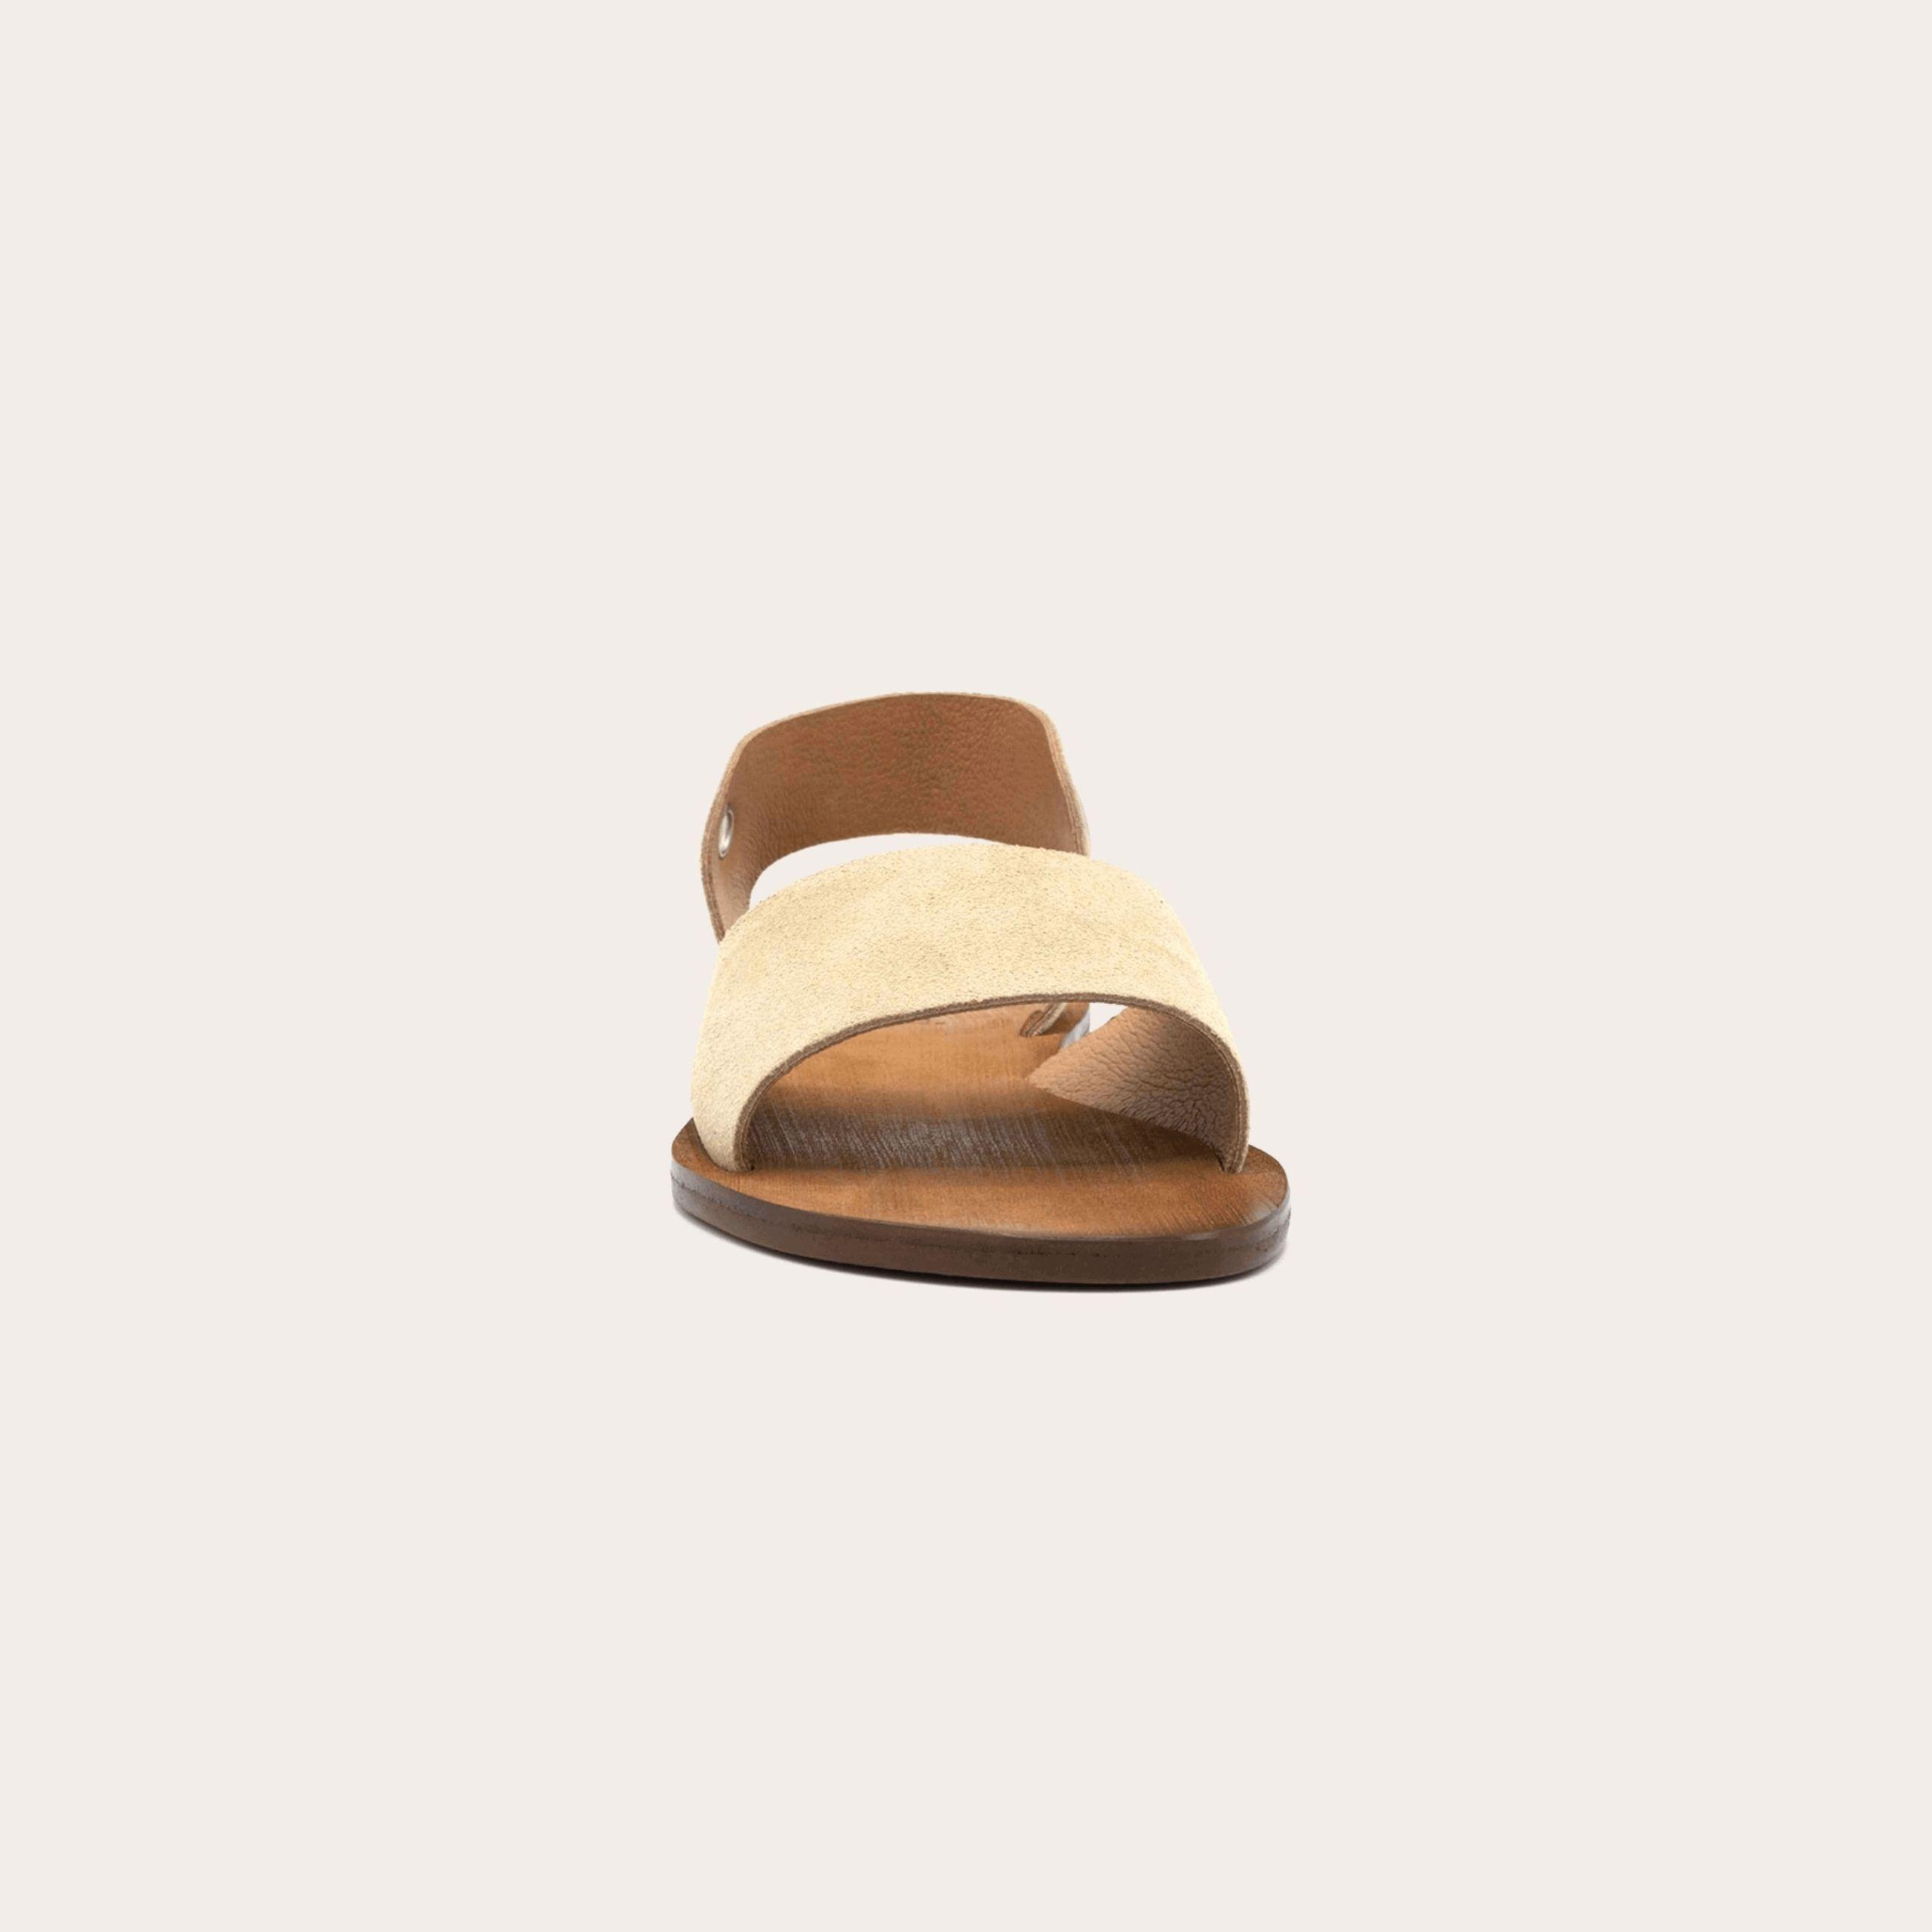 acapulco-beige_4_lintsandalen sandals travelsandals vegan sustainable sandals wikkelsandalen